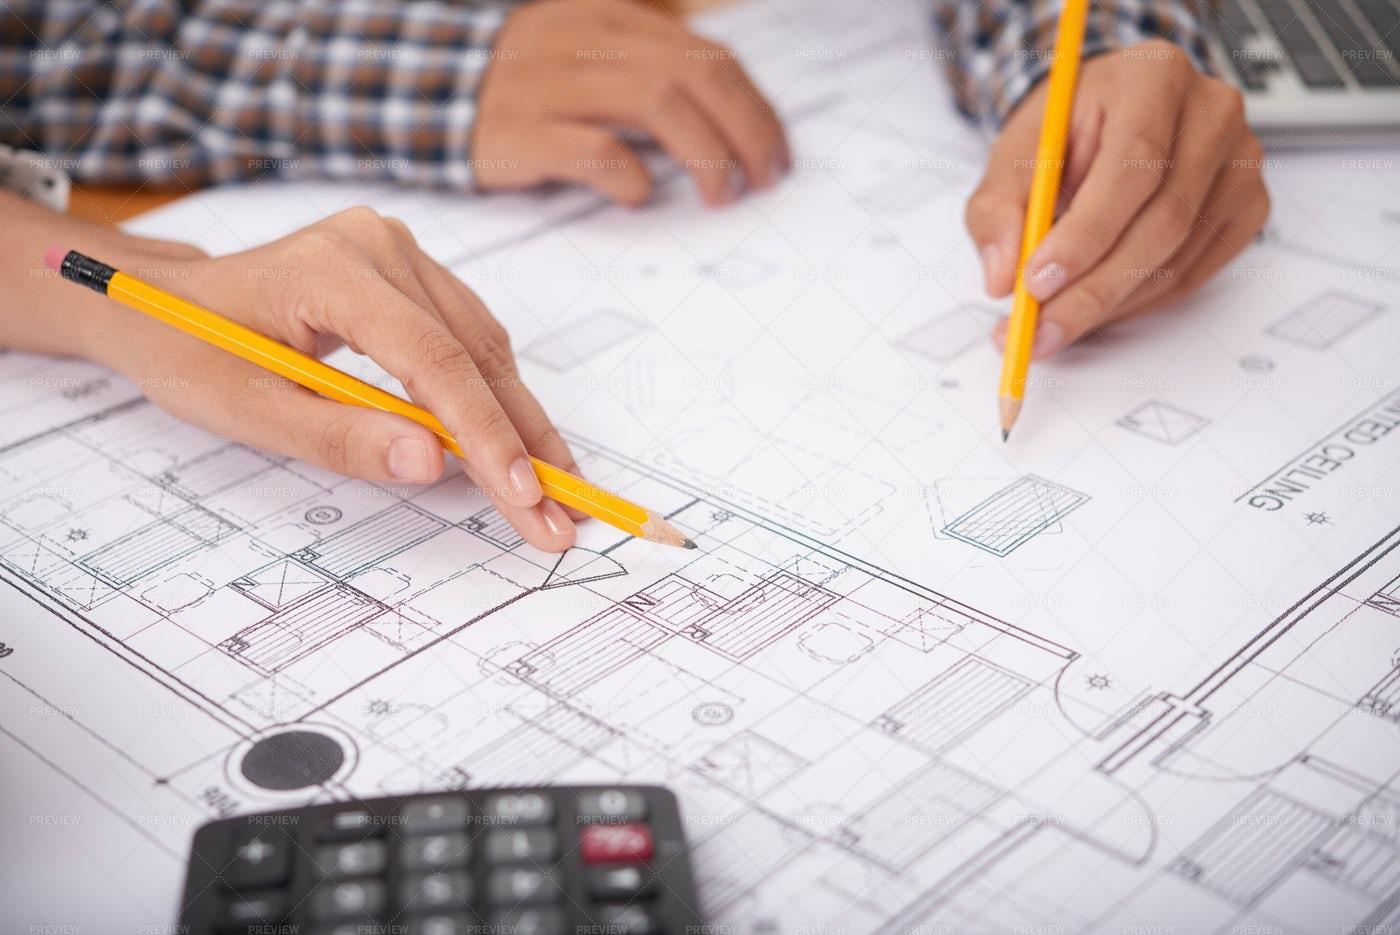 Discussing Construction Plan: Stock Photos